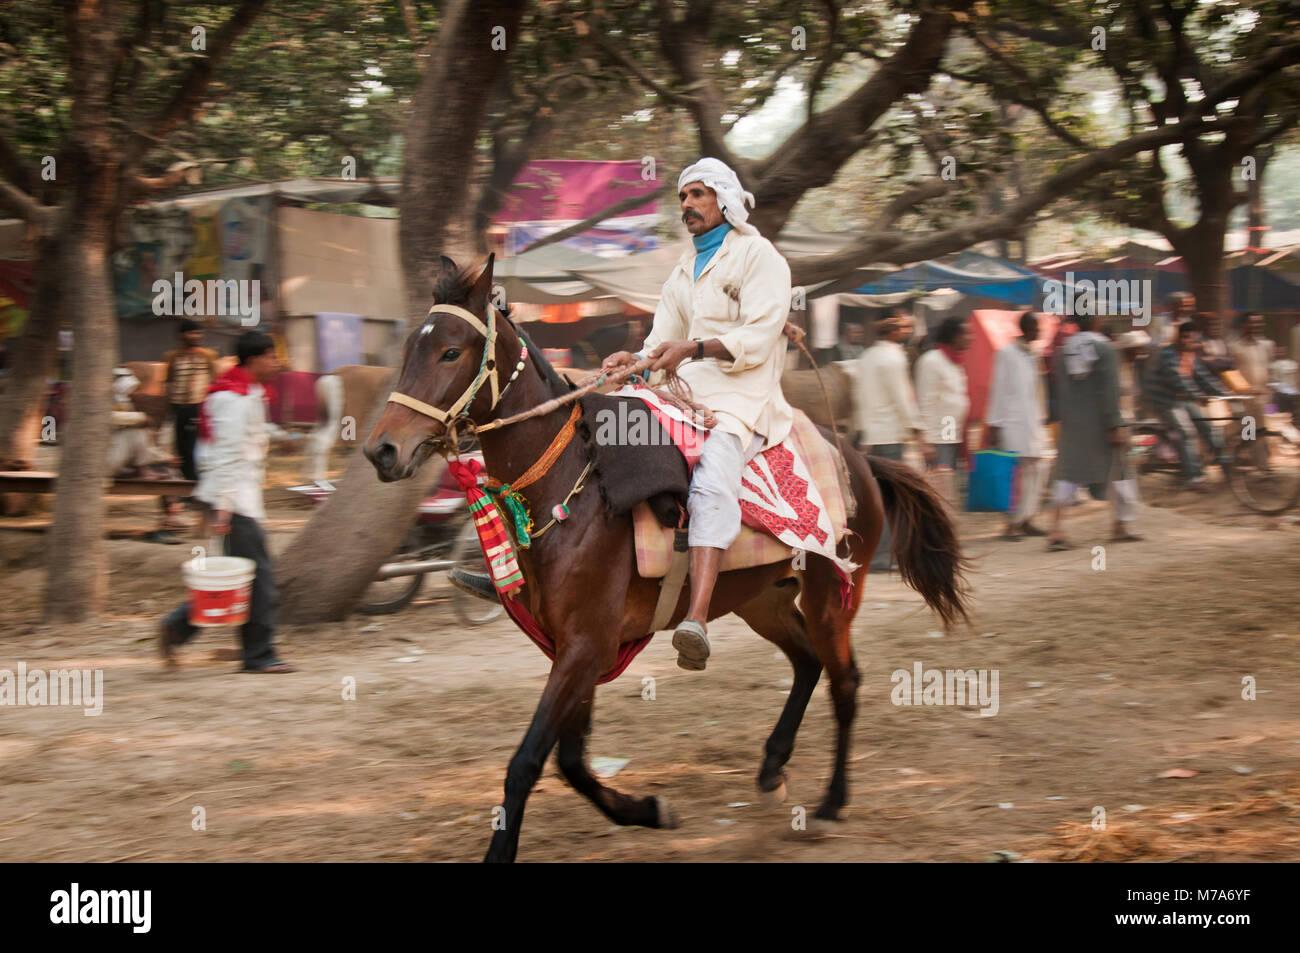 Sonepur Mela Stock Photos & Sonepur Mela Stock Images - Alamy